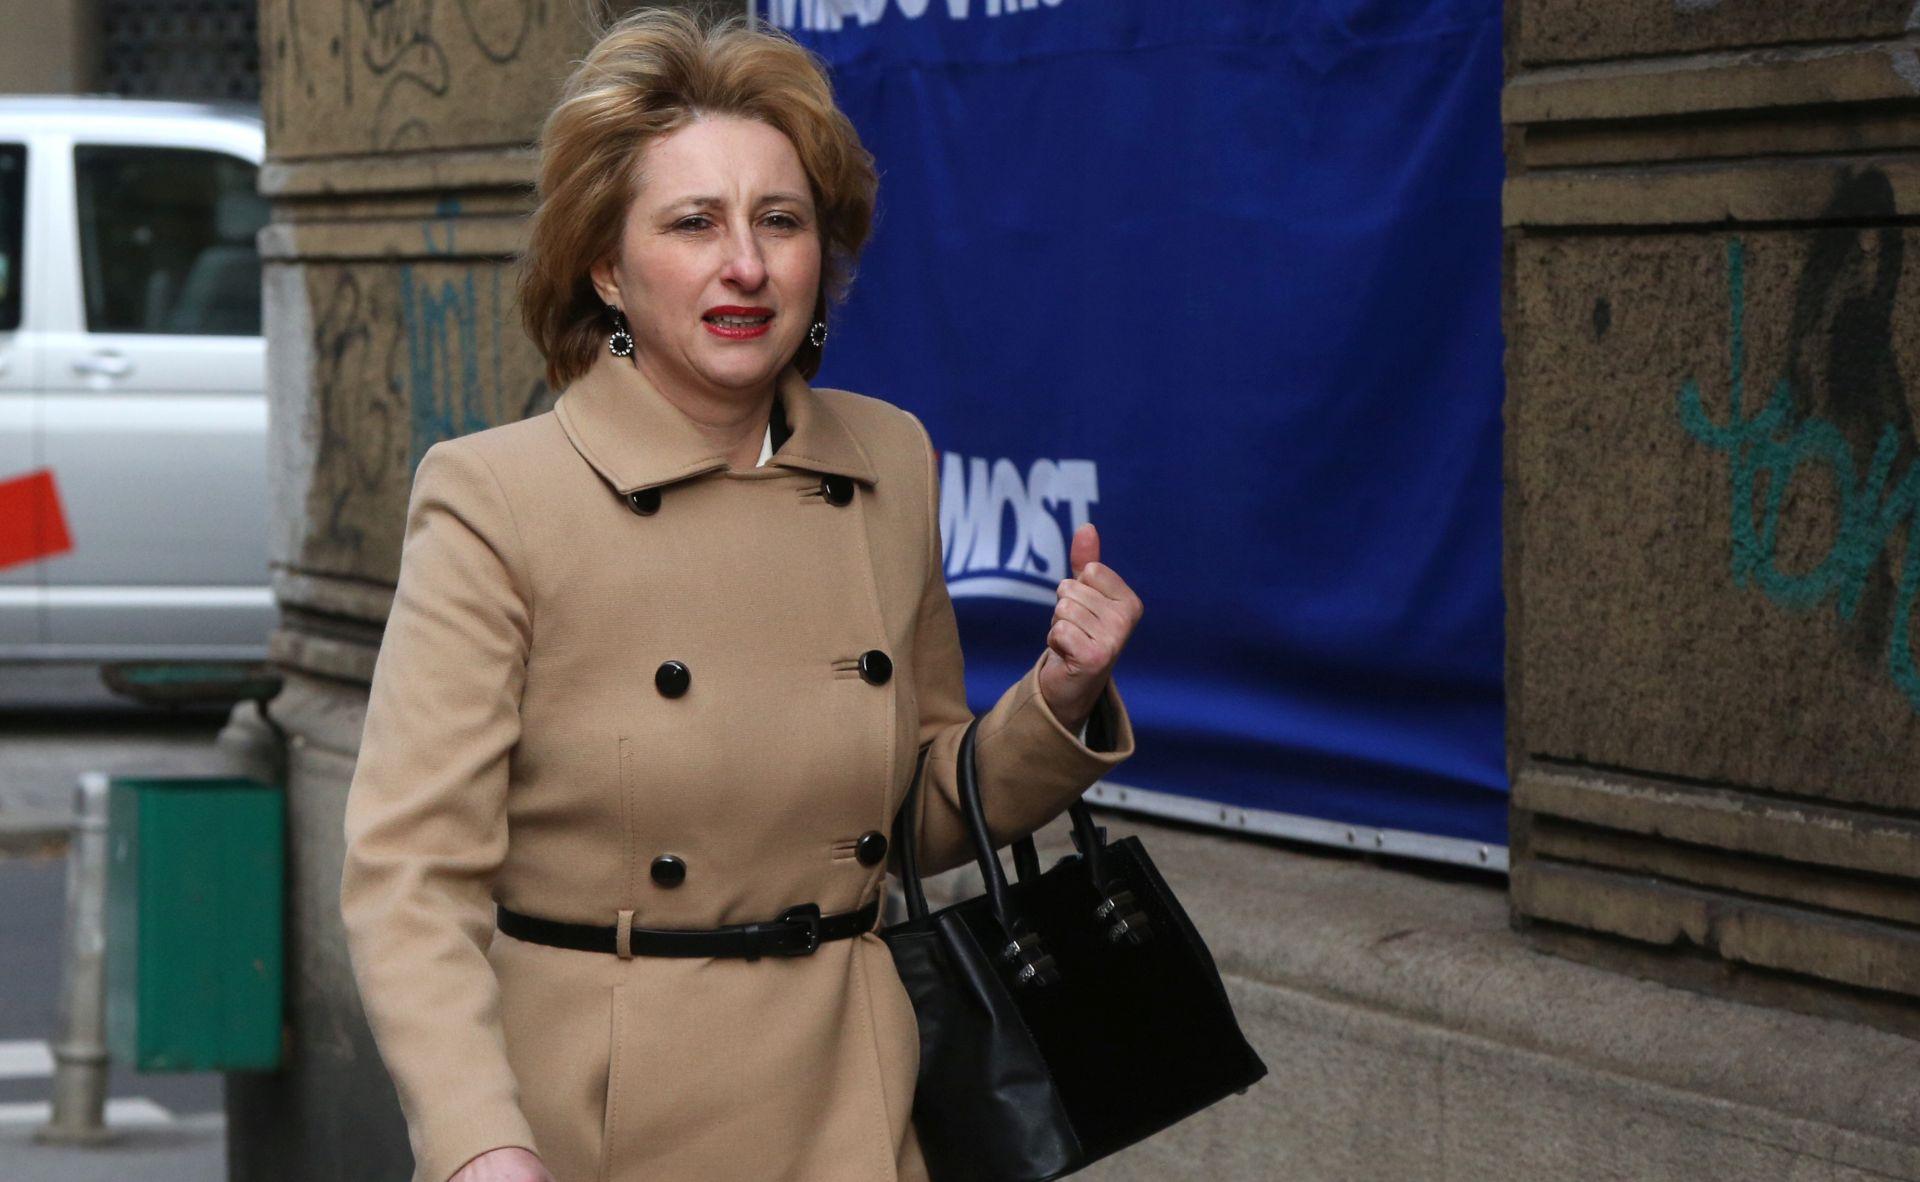 HRID Gordana Rusak: Poziv da vratim mandat je bespredmetan